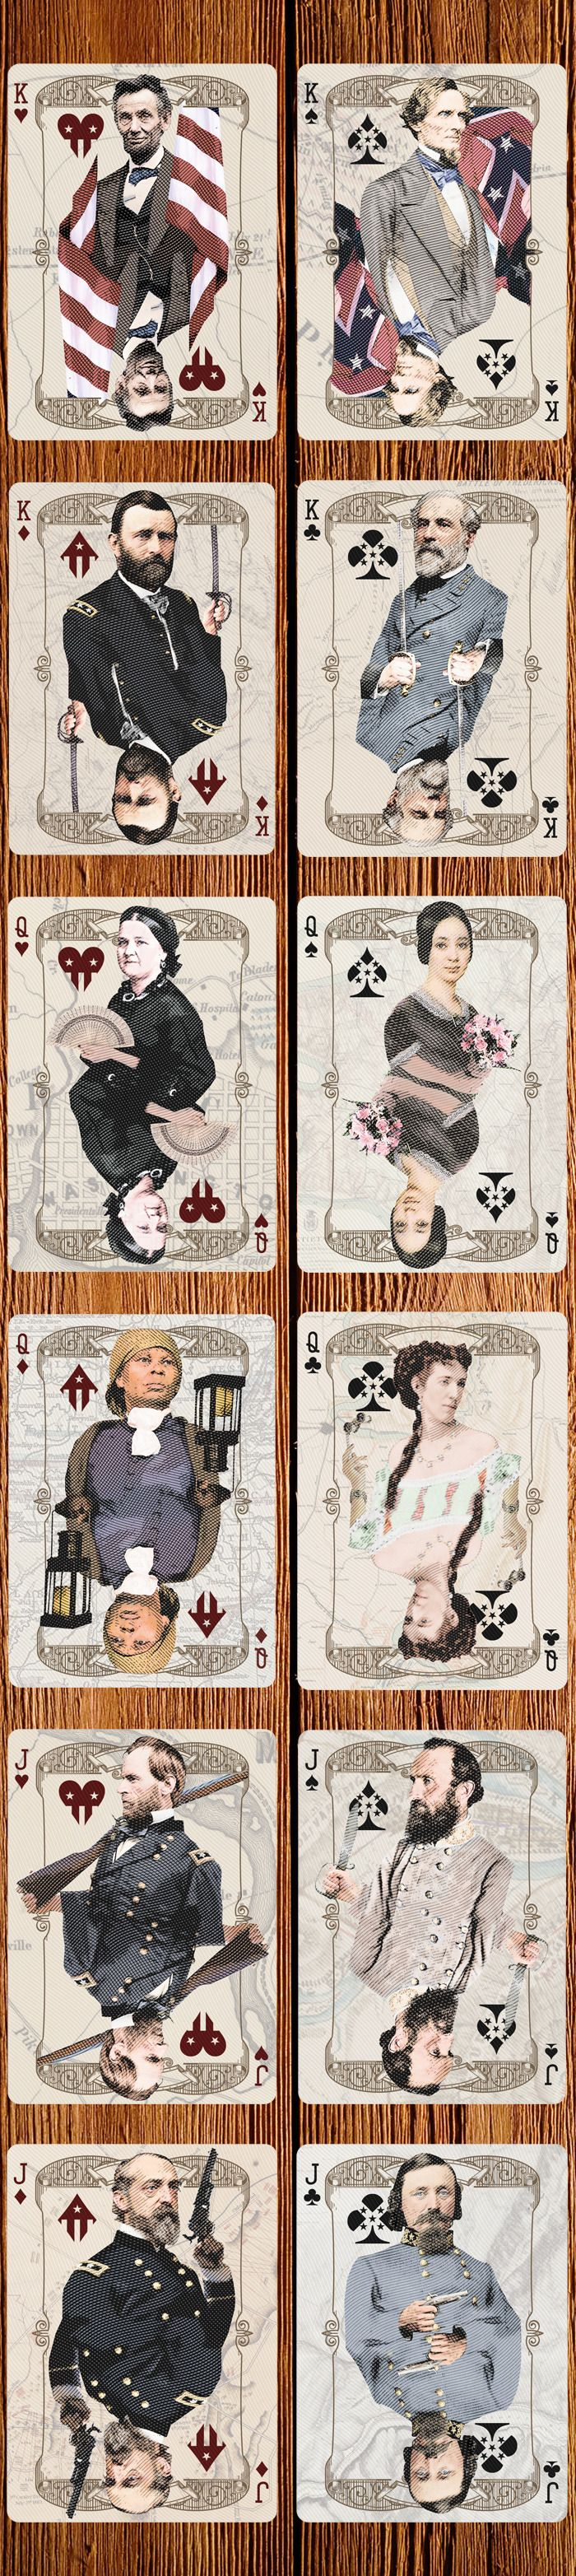 Civil Unrest Custom Playing Cards by USPCC by RJ Tomlinson — Kickstarter